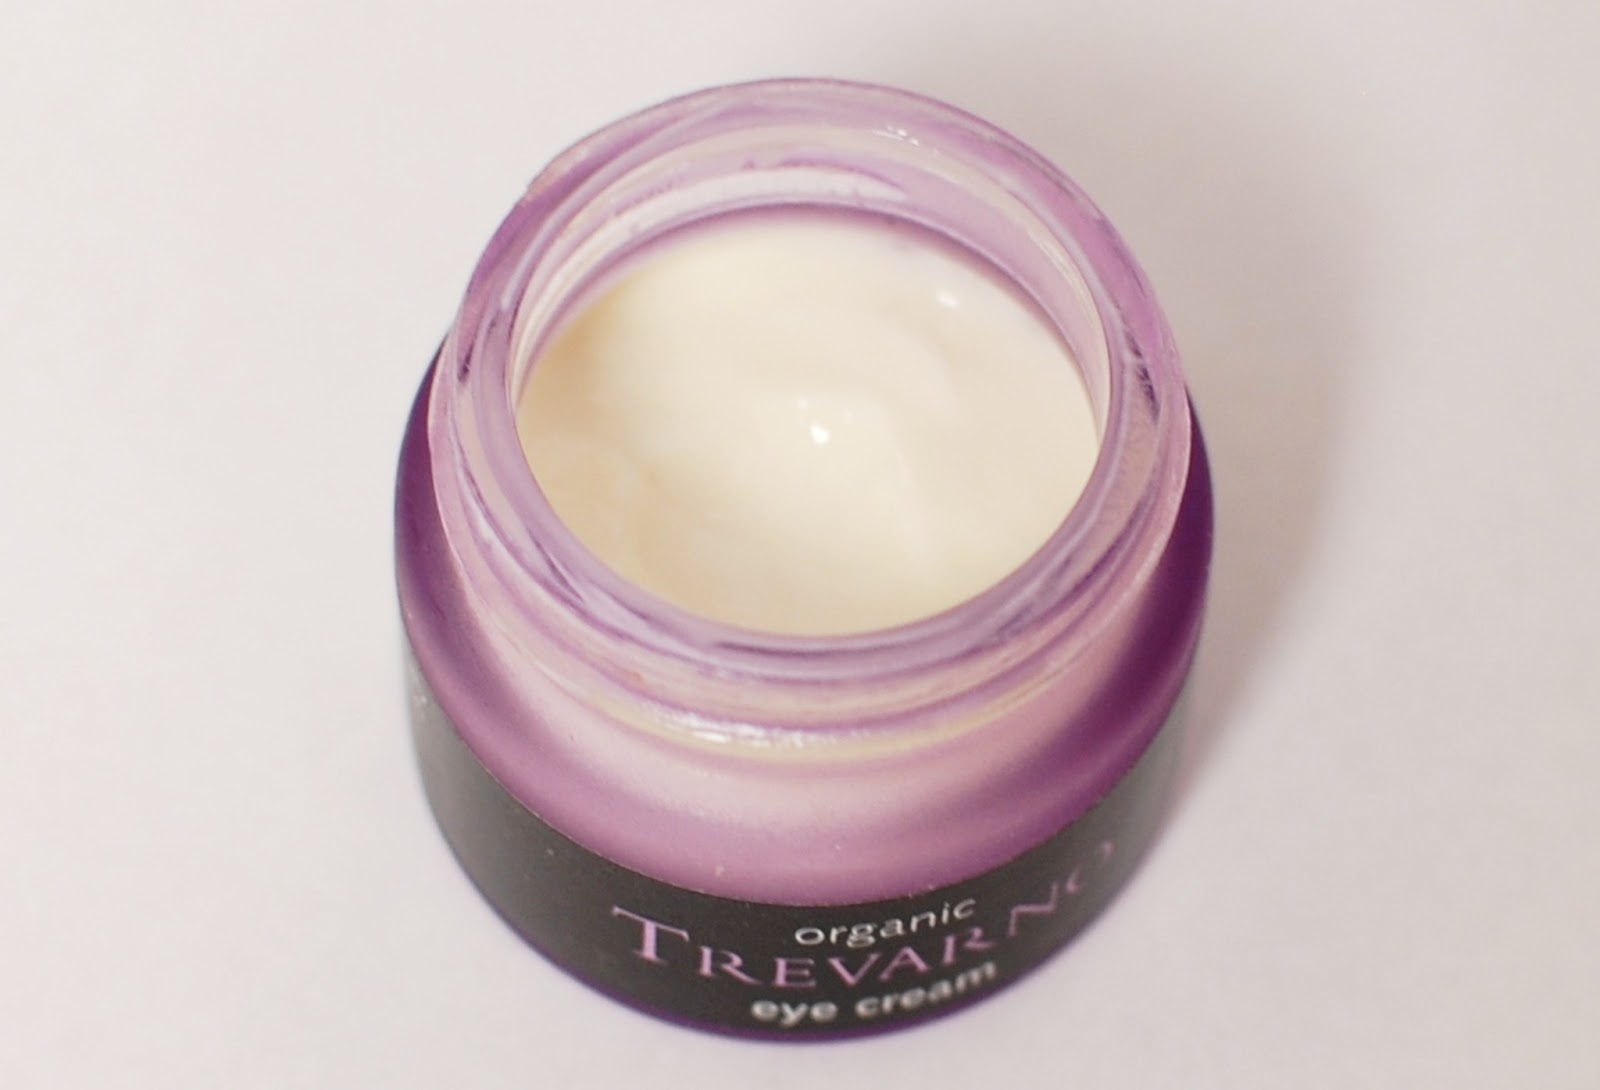 Trevarno Organic Eye Cream